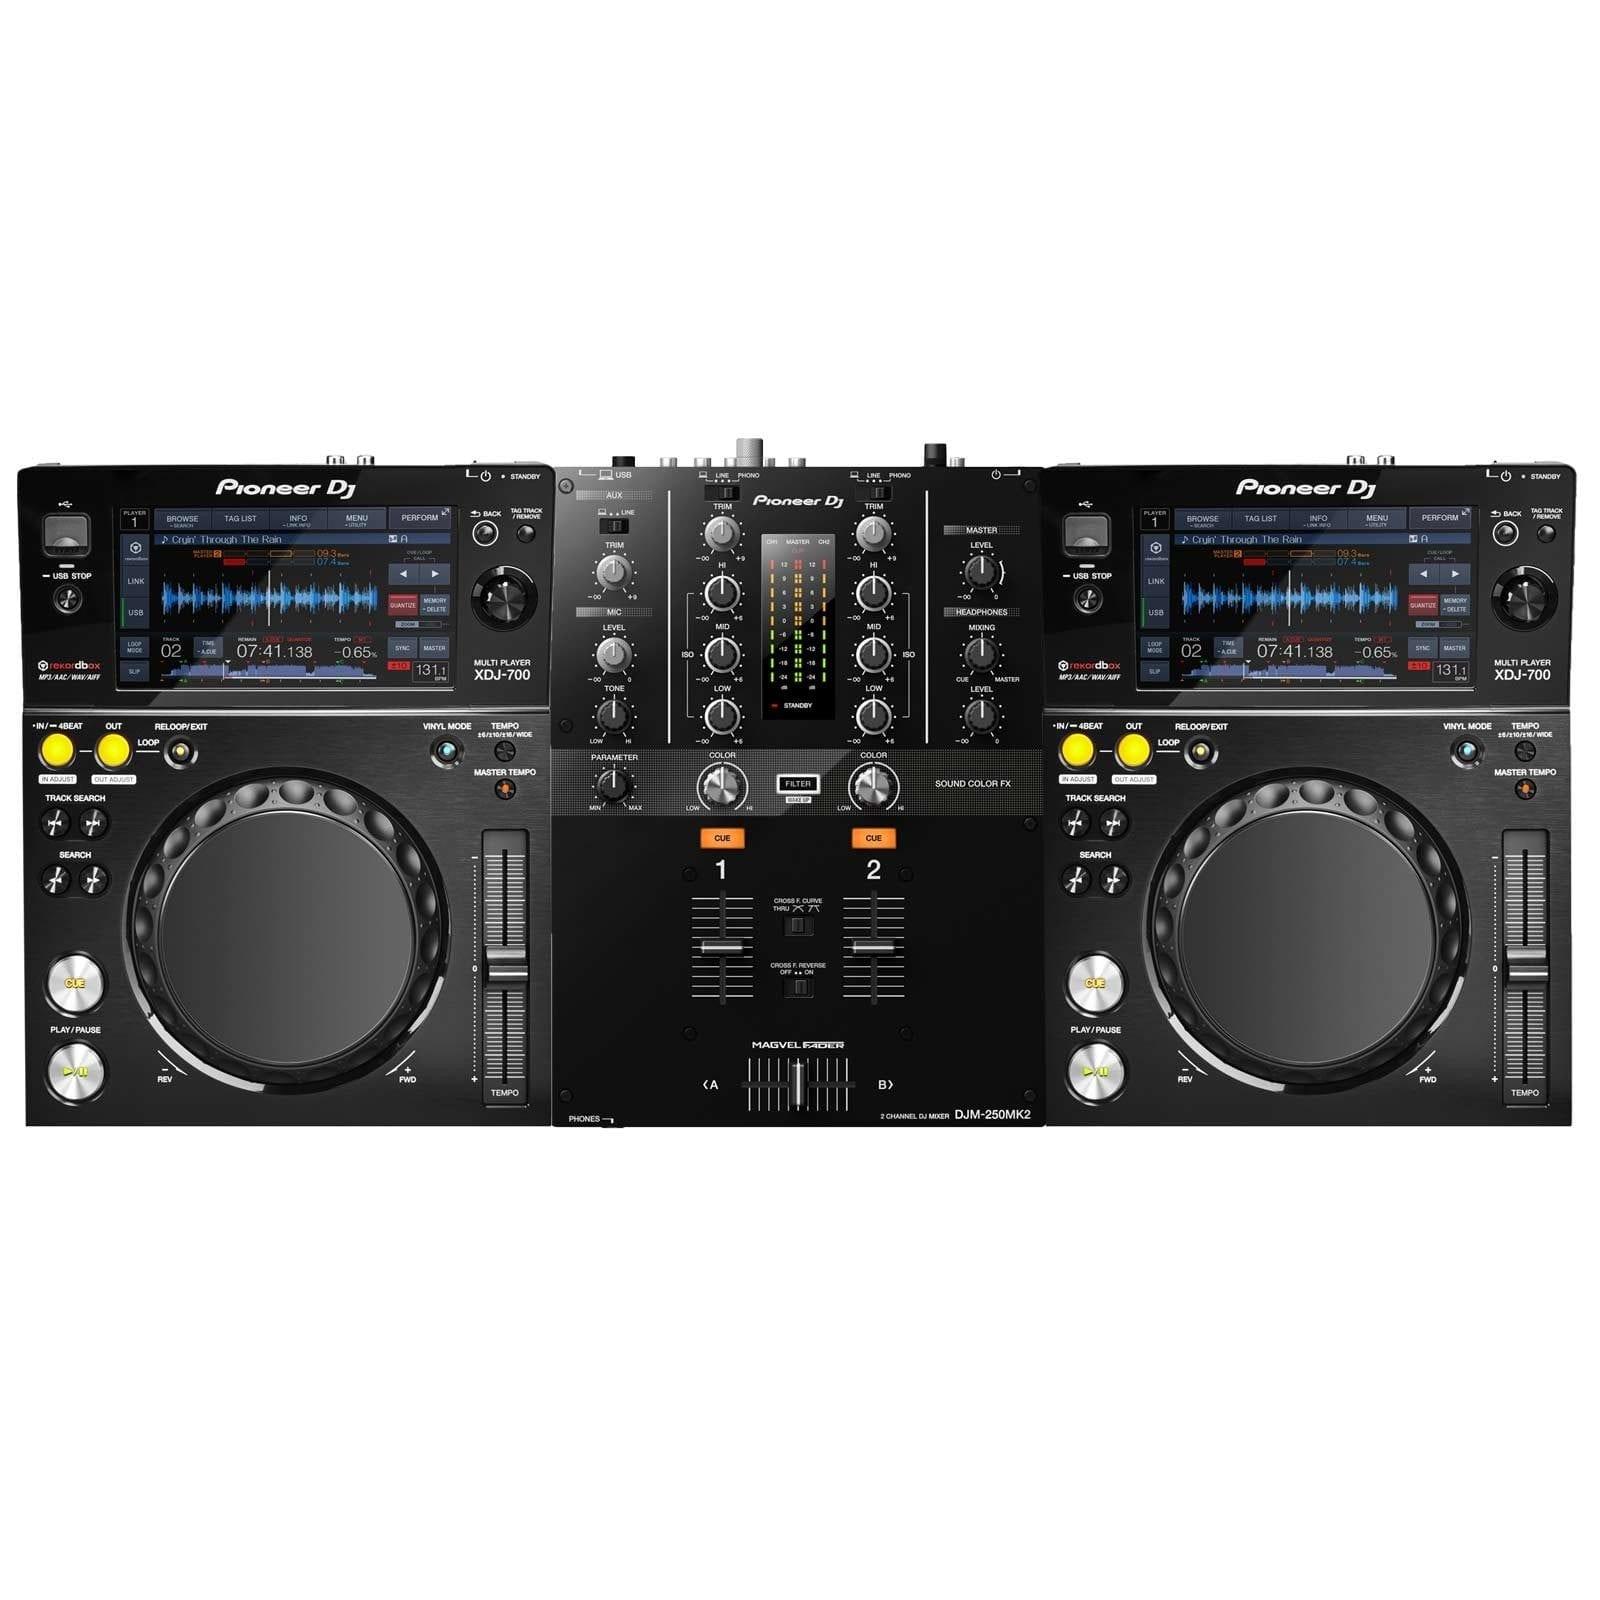 pioneeer-djm-250mk2-2-channel-mixer-with-2-pioneer-xdj-700-compact-digital-decks-pro-dj-package-82c